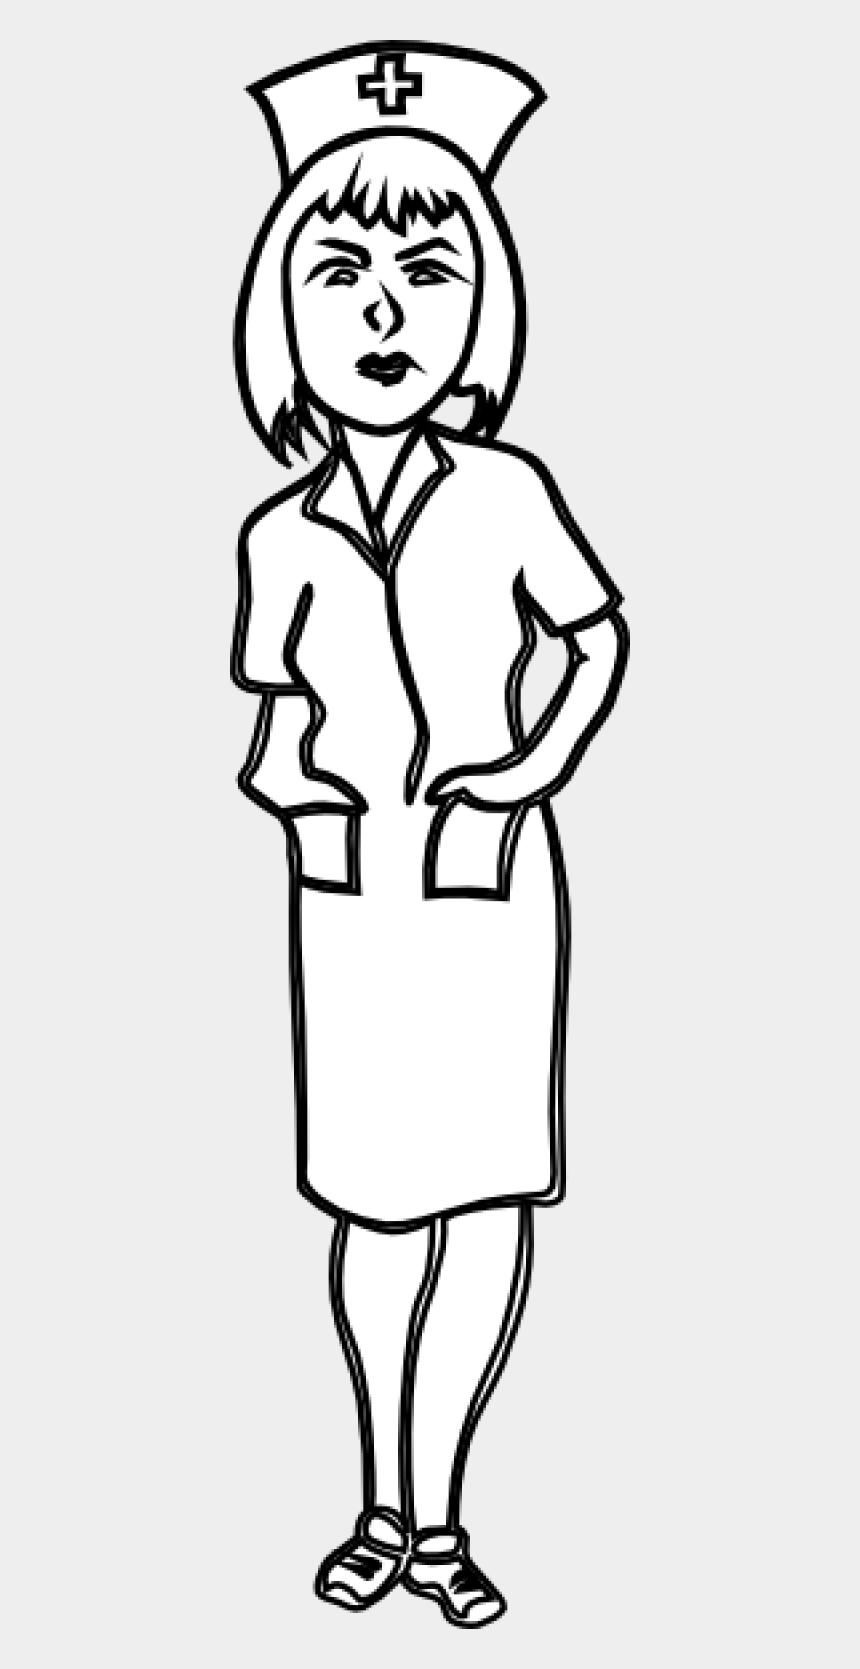 Cartoon Nurse Clipart Black And White